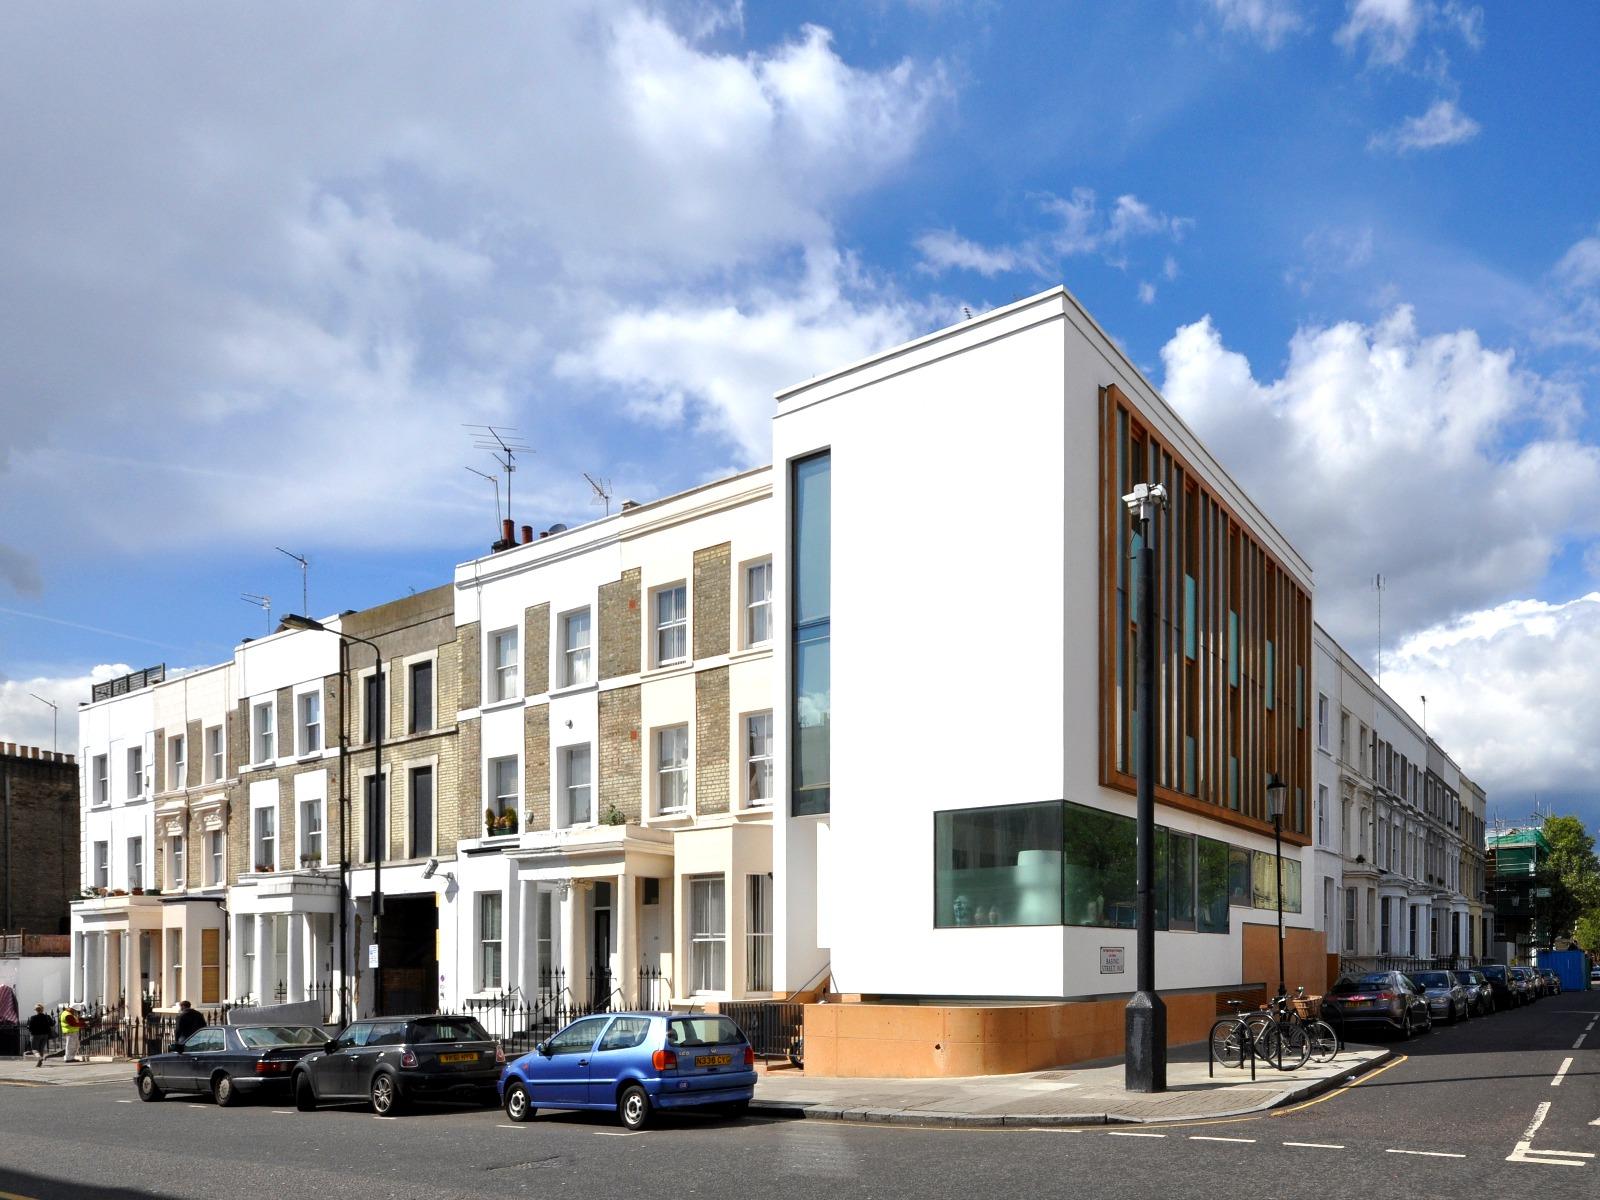 London Architecture Photography Modern